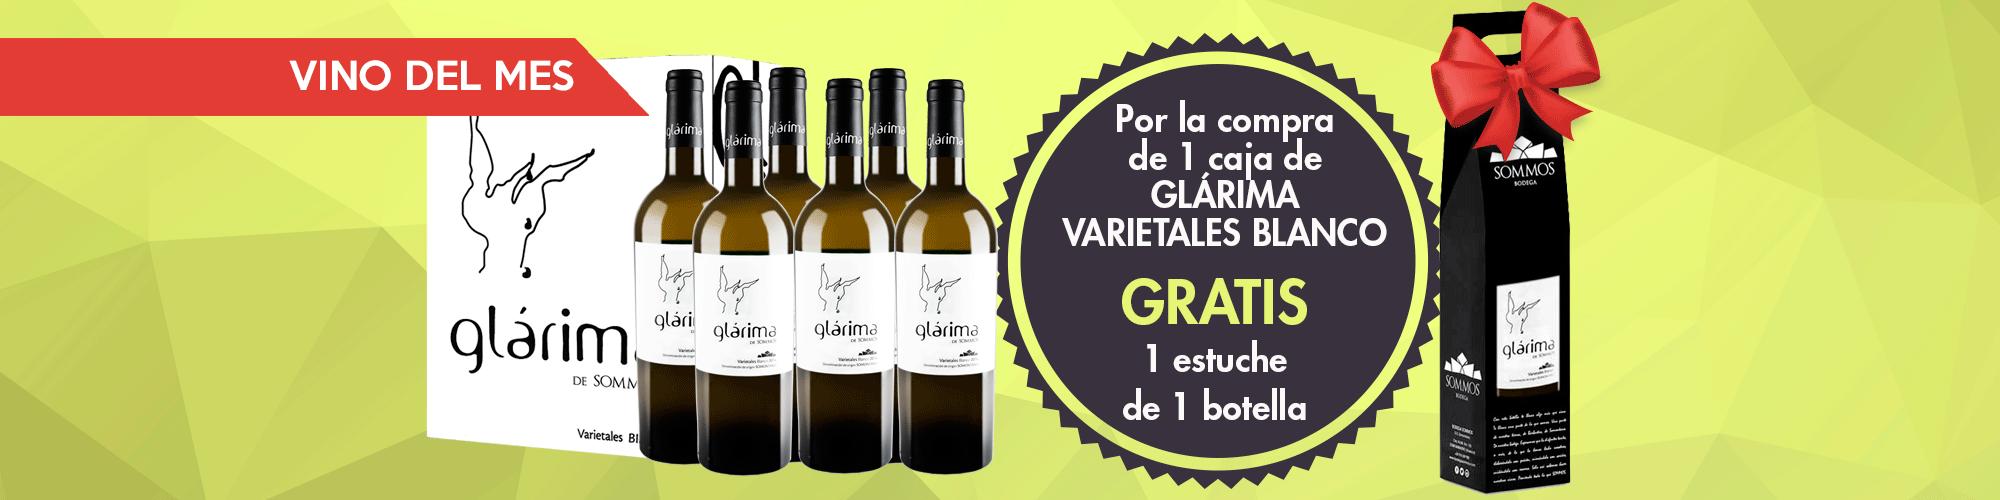 glarima-varietales-blanco-vino-del-mes-tienda-sommos-slider-marzo